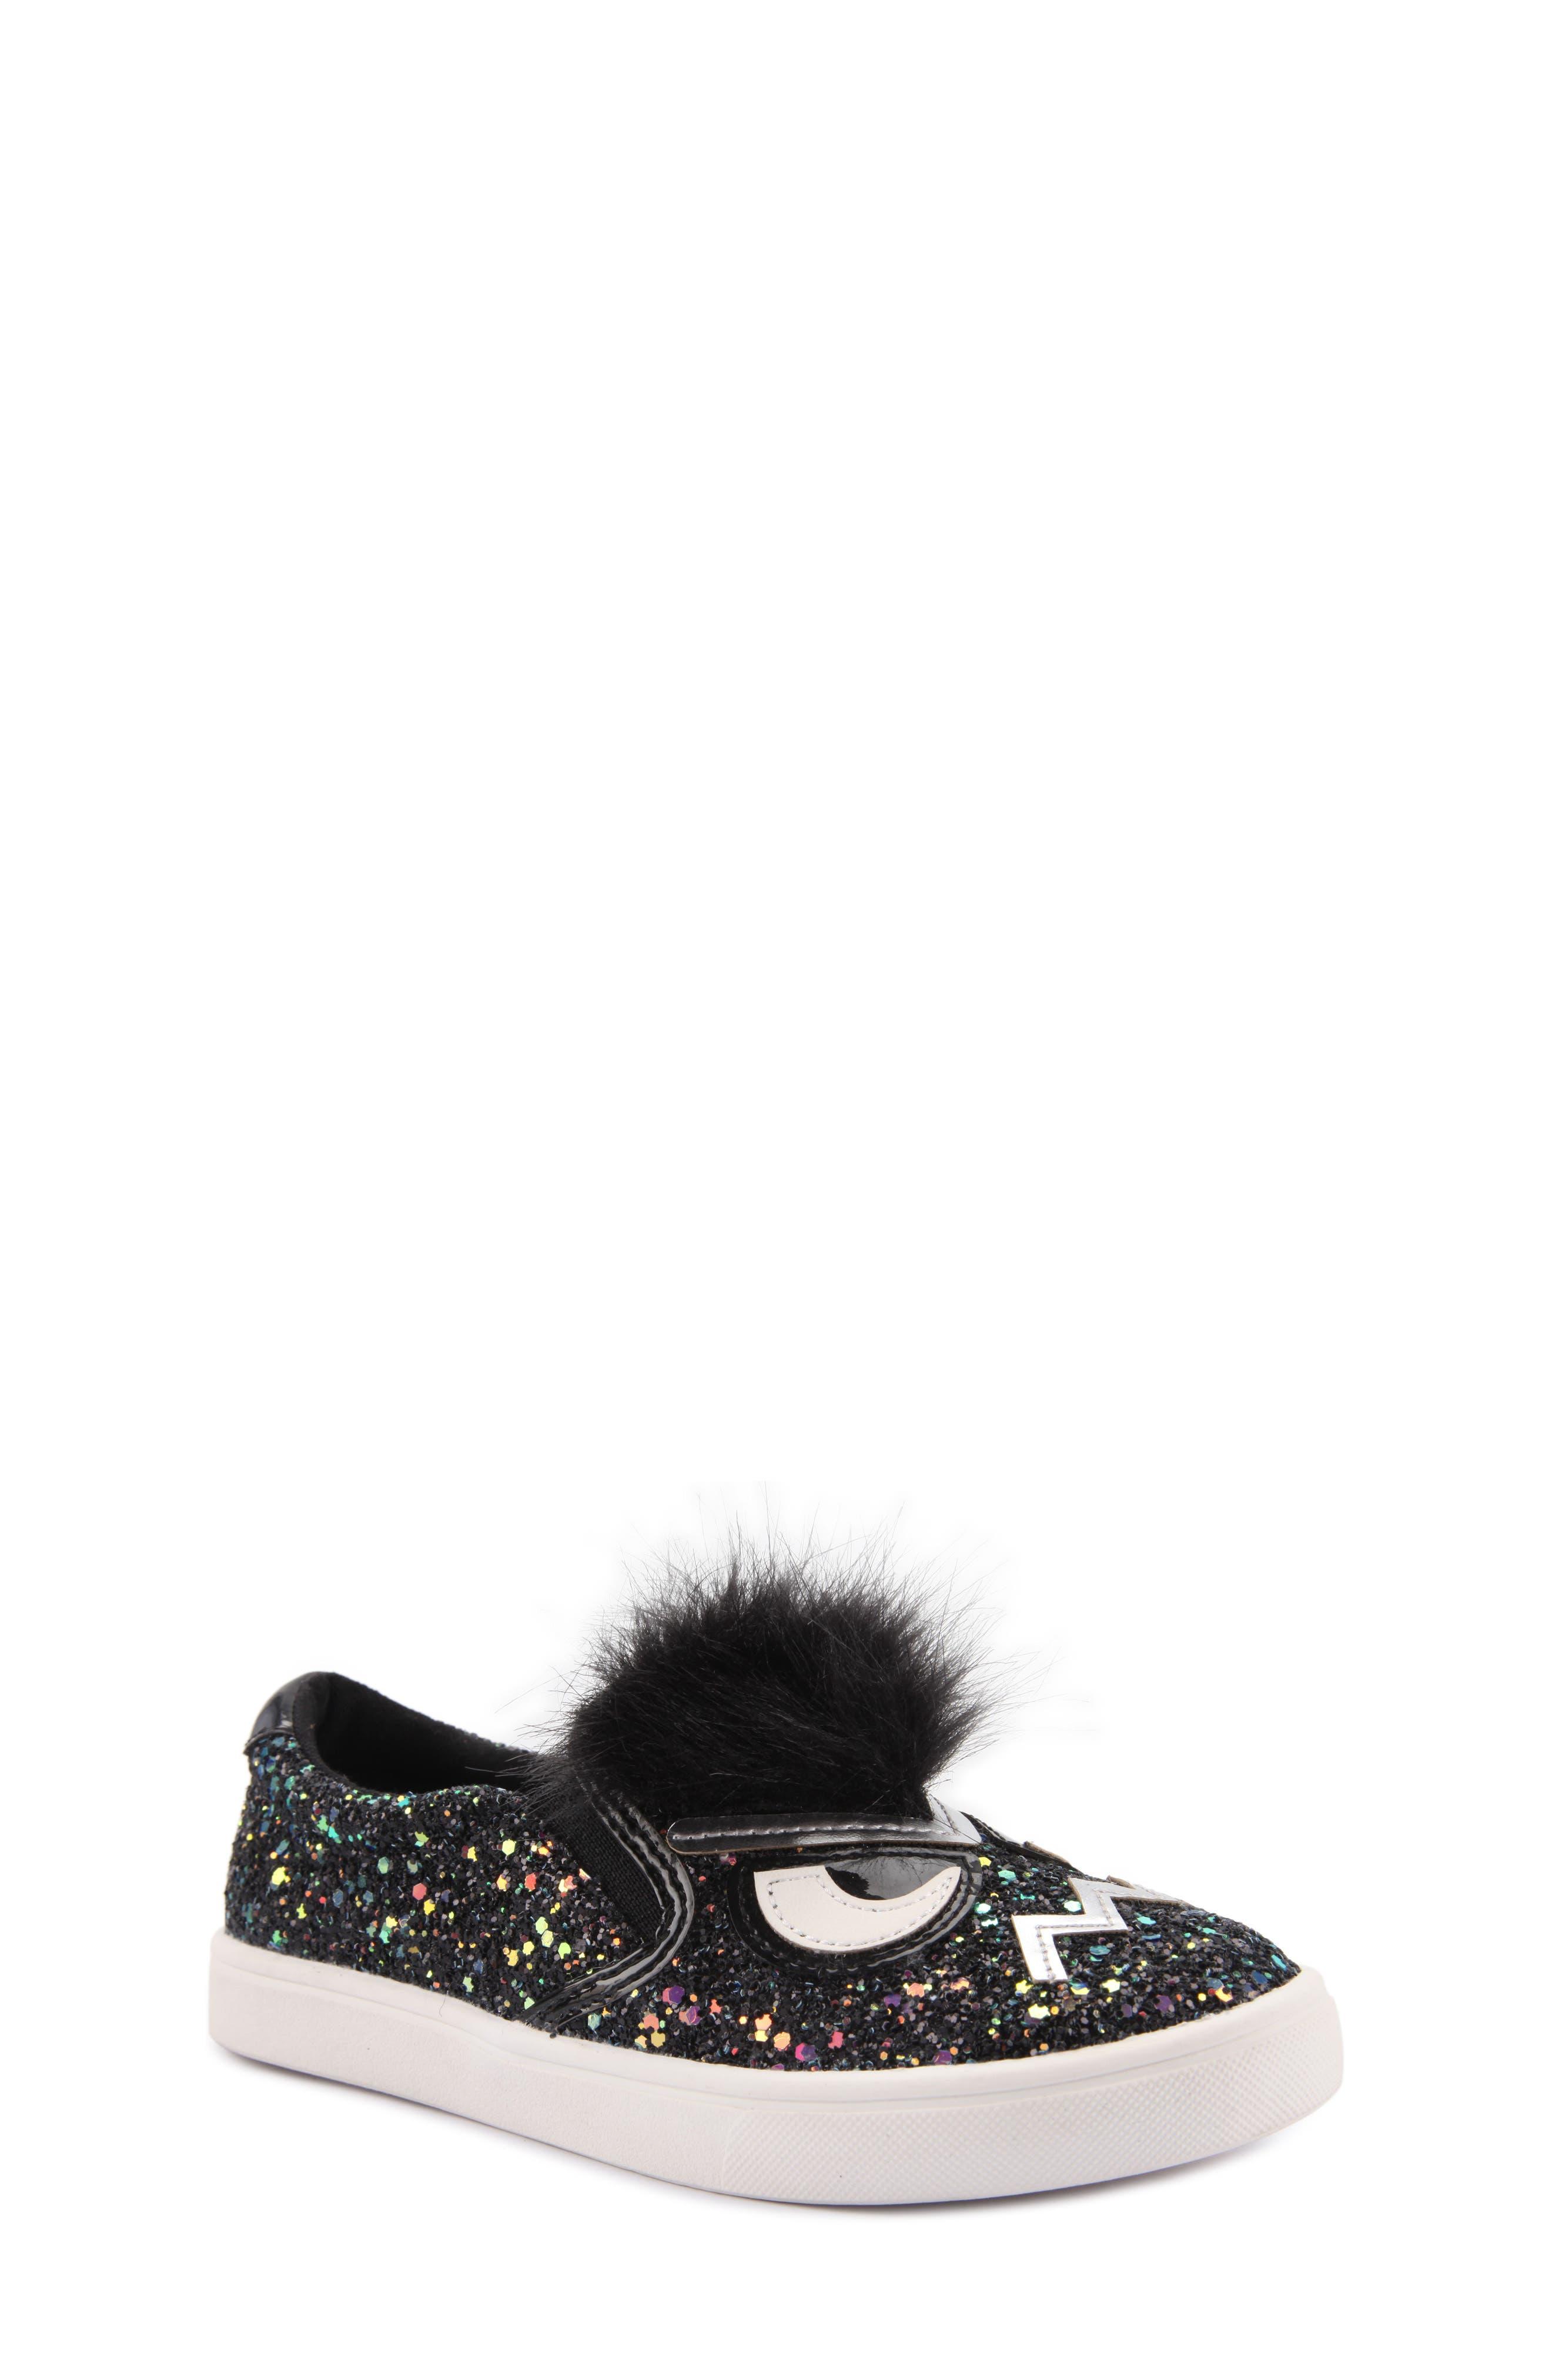 Main Image - Nina Alyx Faux Fur Glittery Slip-On Sneaker (Walker & Toddler)